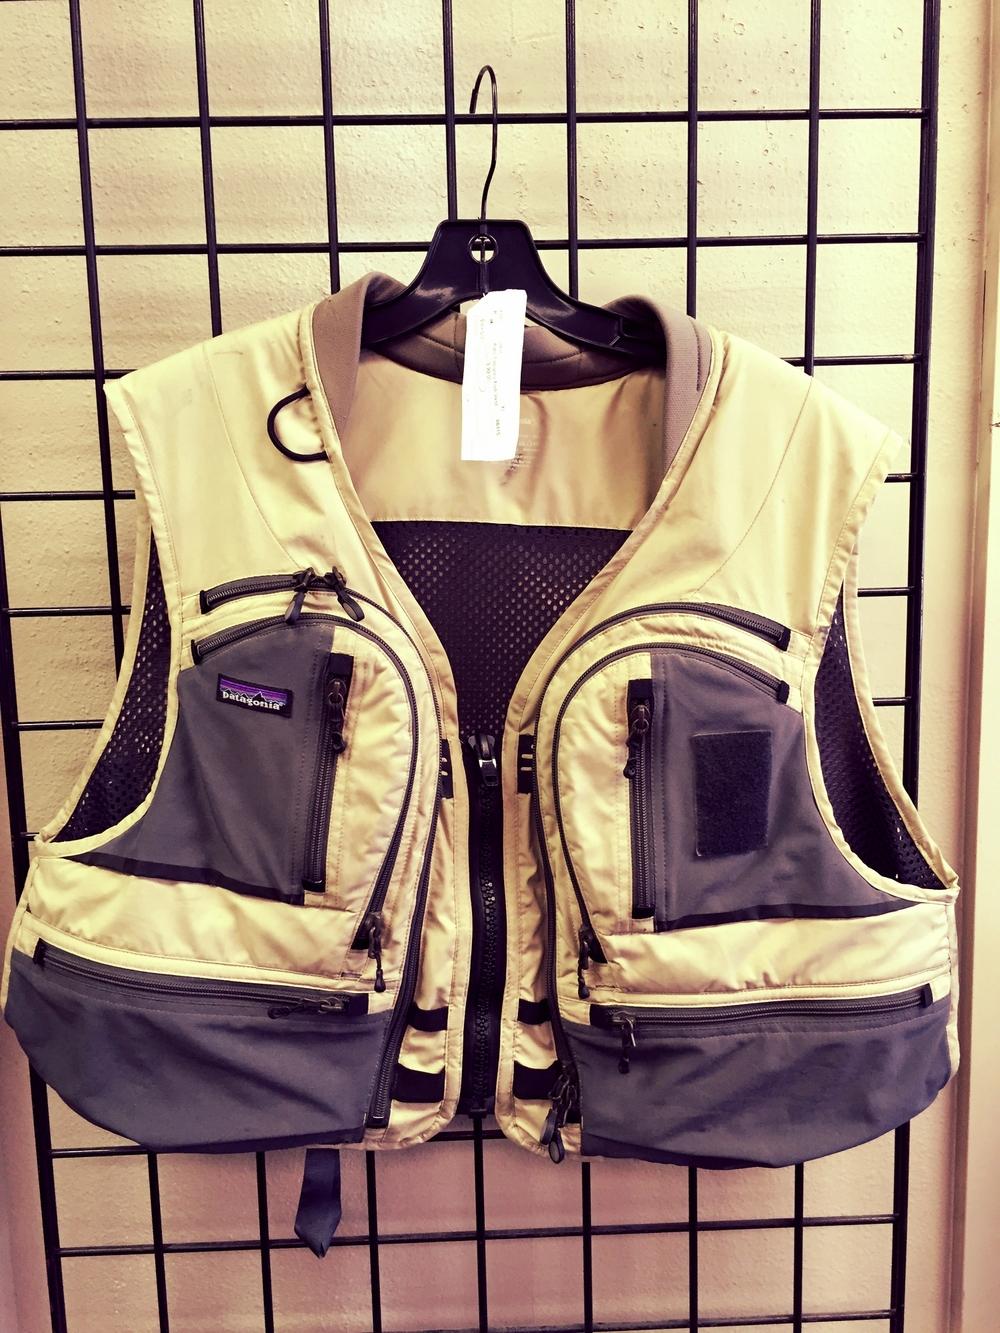 Patagonia Fishing Vest XL - $79.20